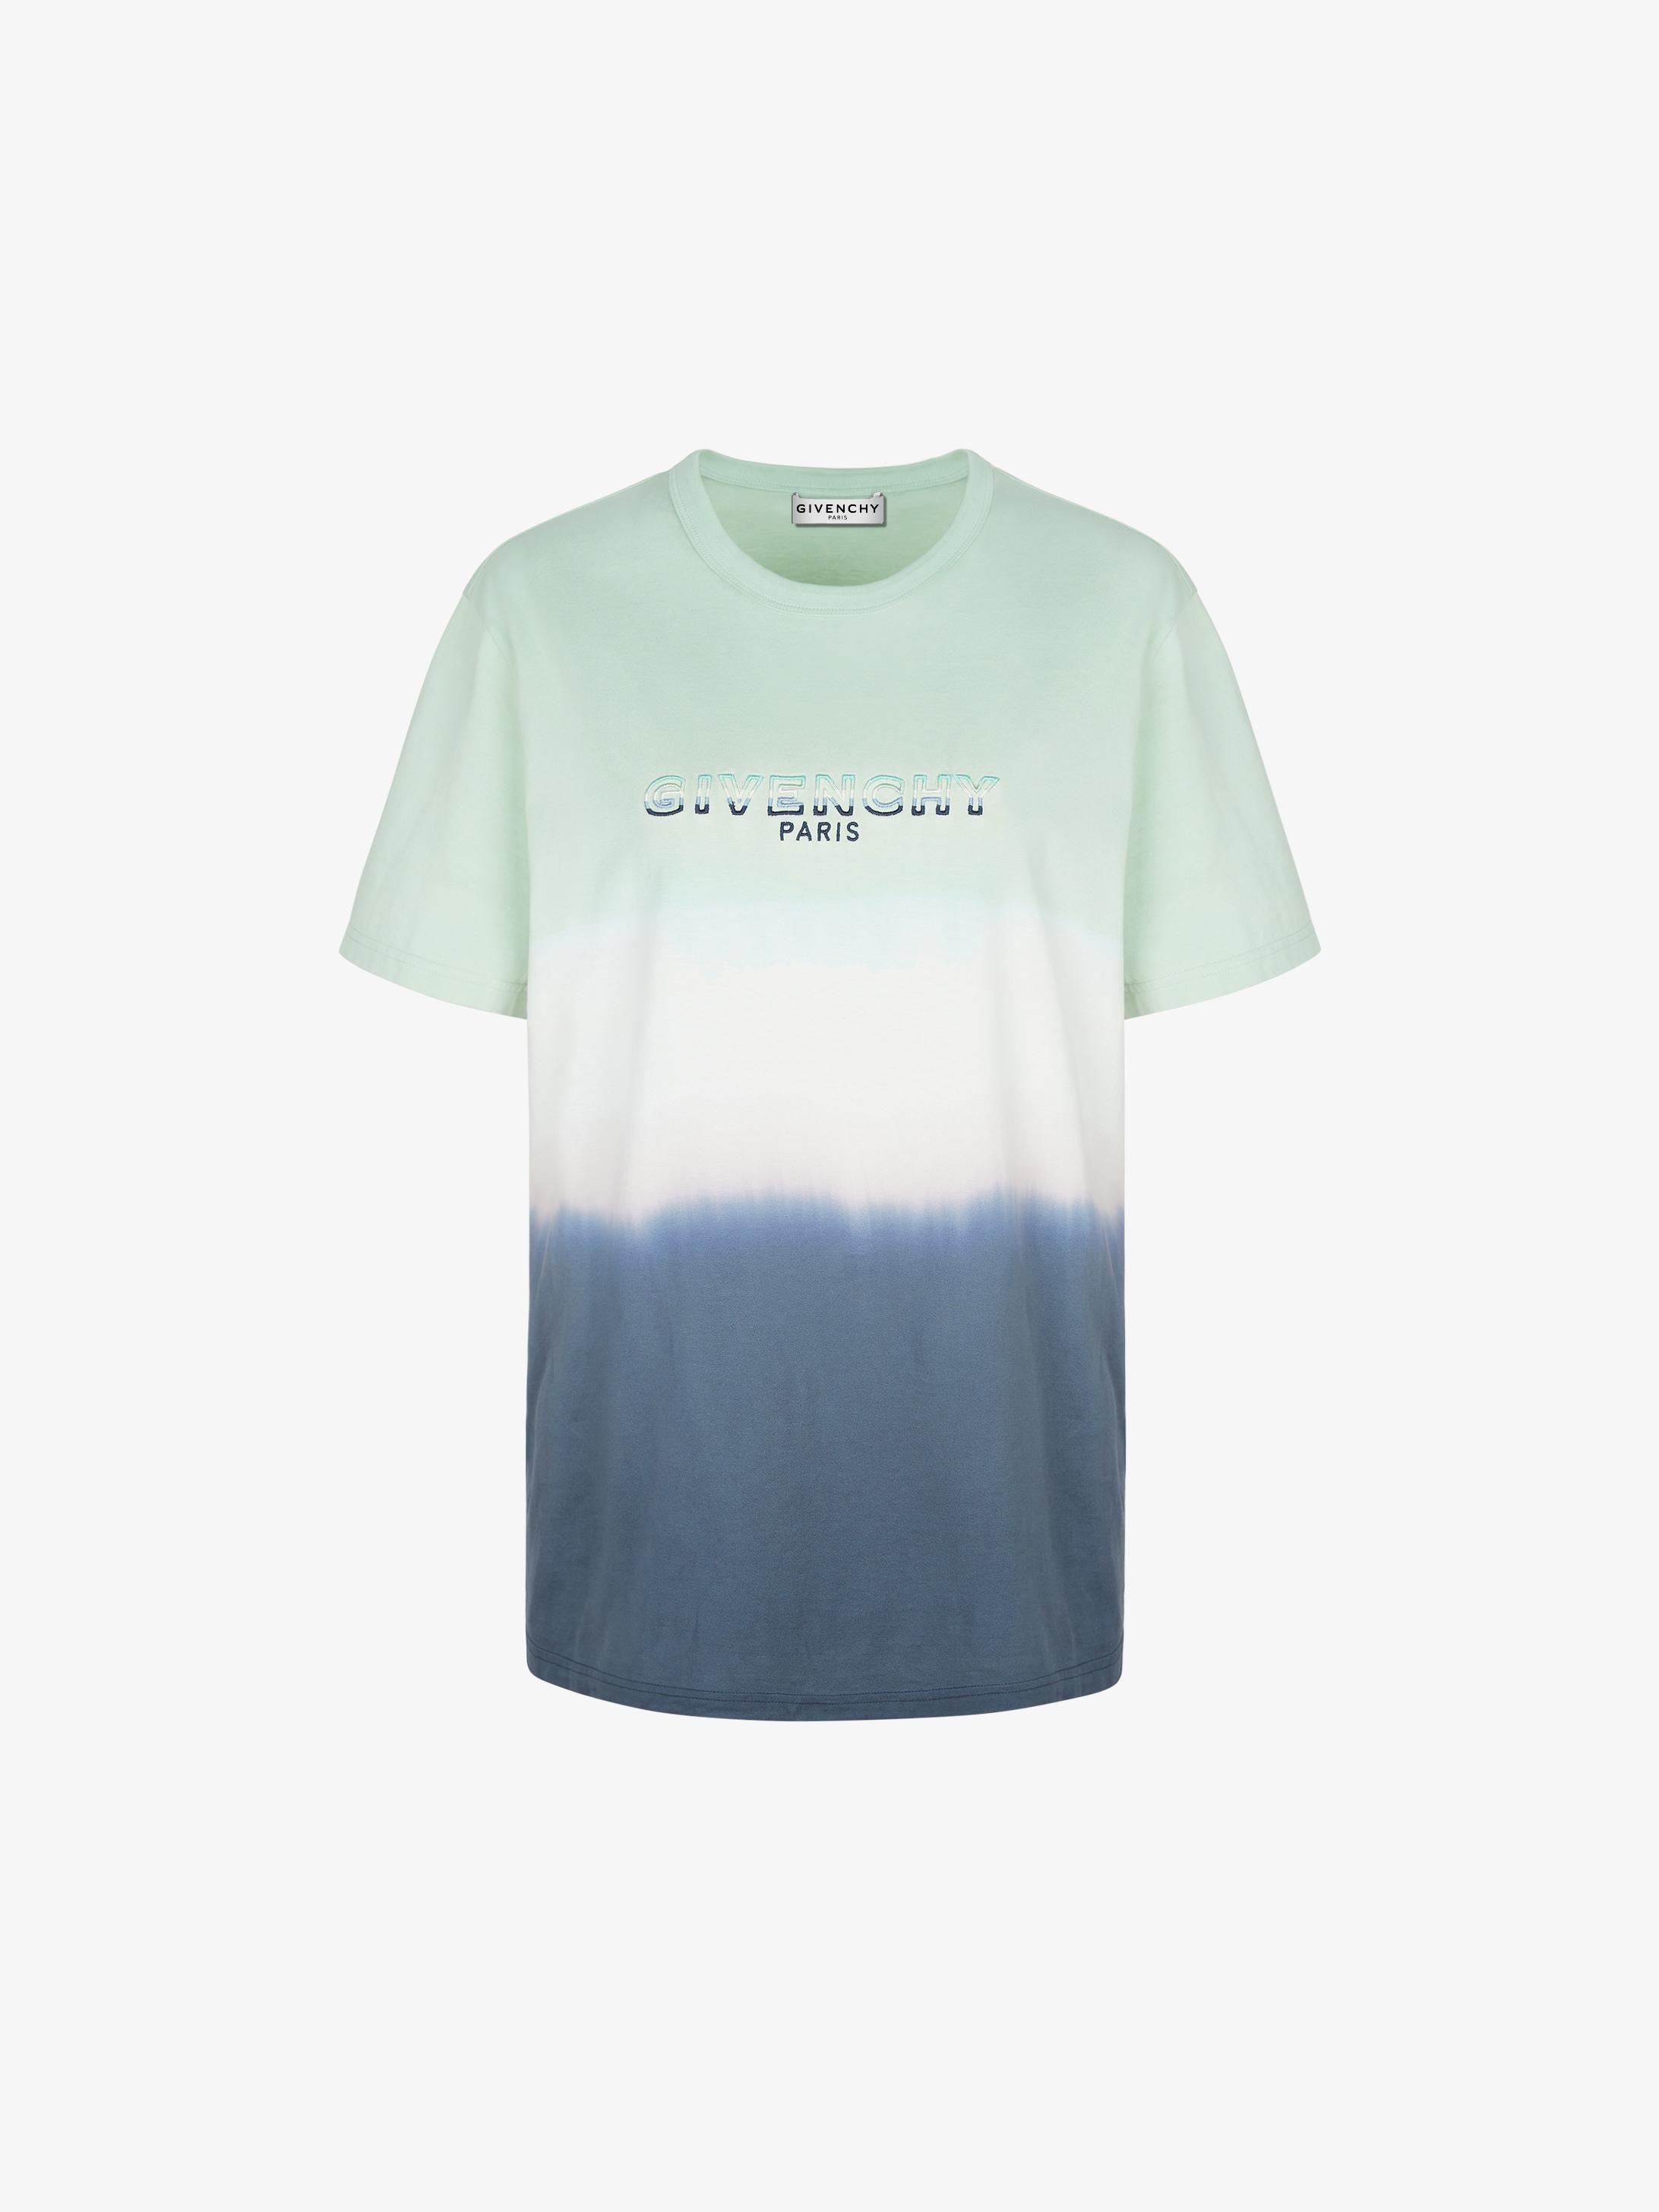 T-shirt GIVENCHY dégradé